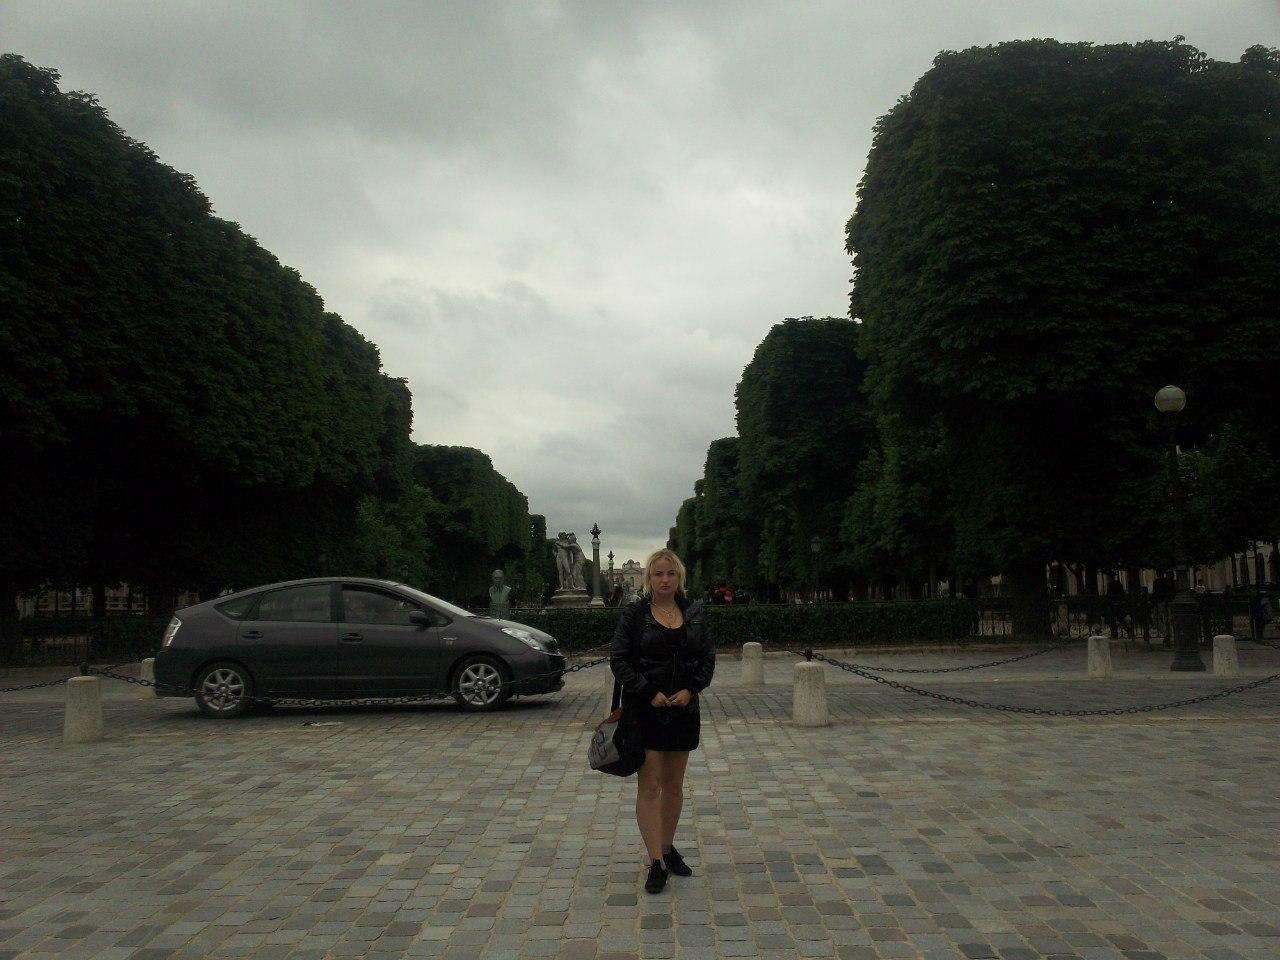 Елена Руденко. Франция. Париж. 2013 г. июнь. 94SaBkVJRzA